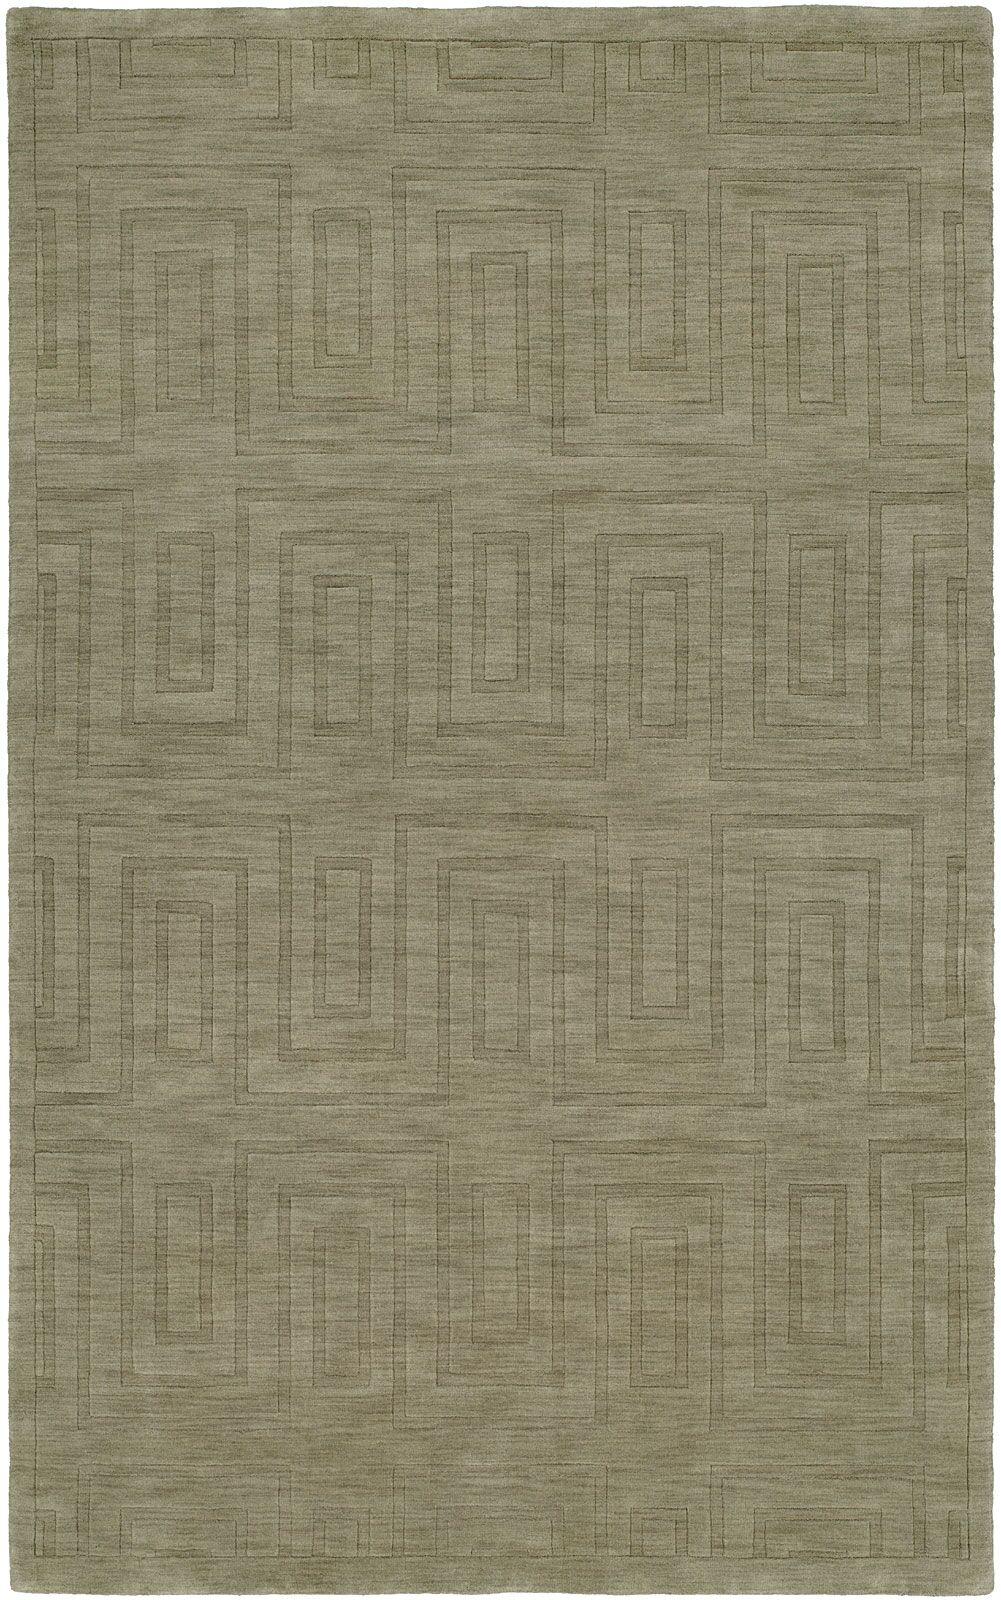 Chanda Hand-Woven Gray Area Rug Rug Size: 5' x 8'